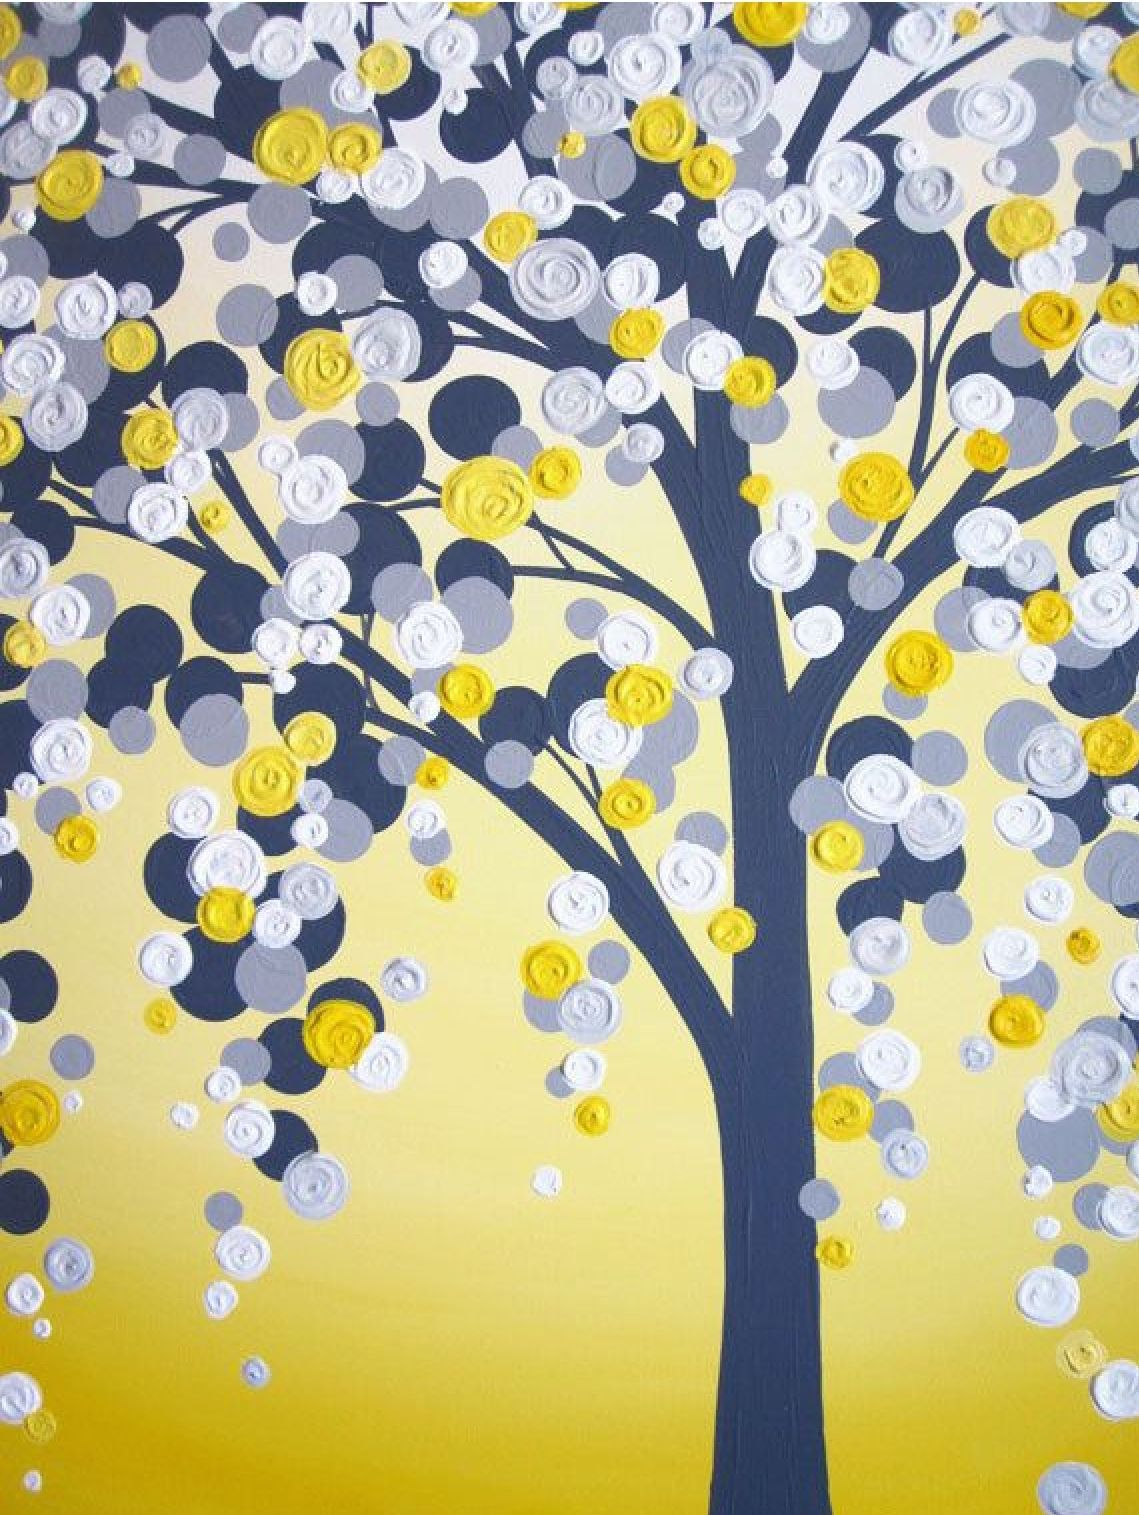 Badezimmer ideen gelb und grau yellow colour inspiration aw baraboux  floral pattern in